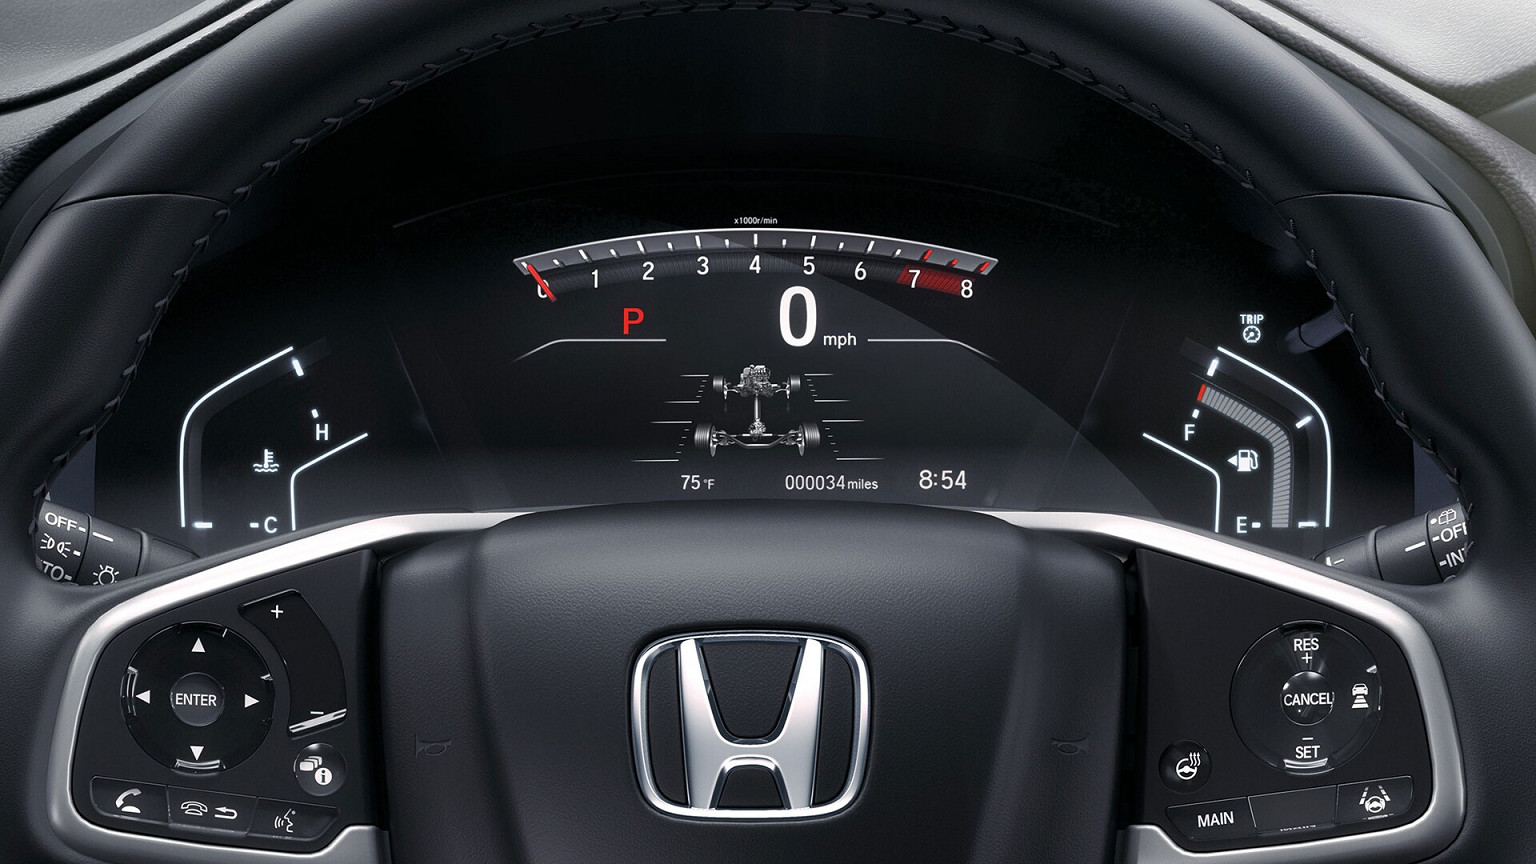 Instrument Panel in the 2020 Honda CR-V